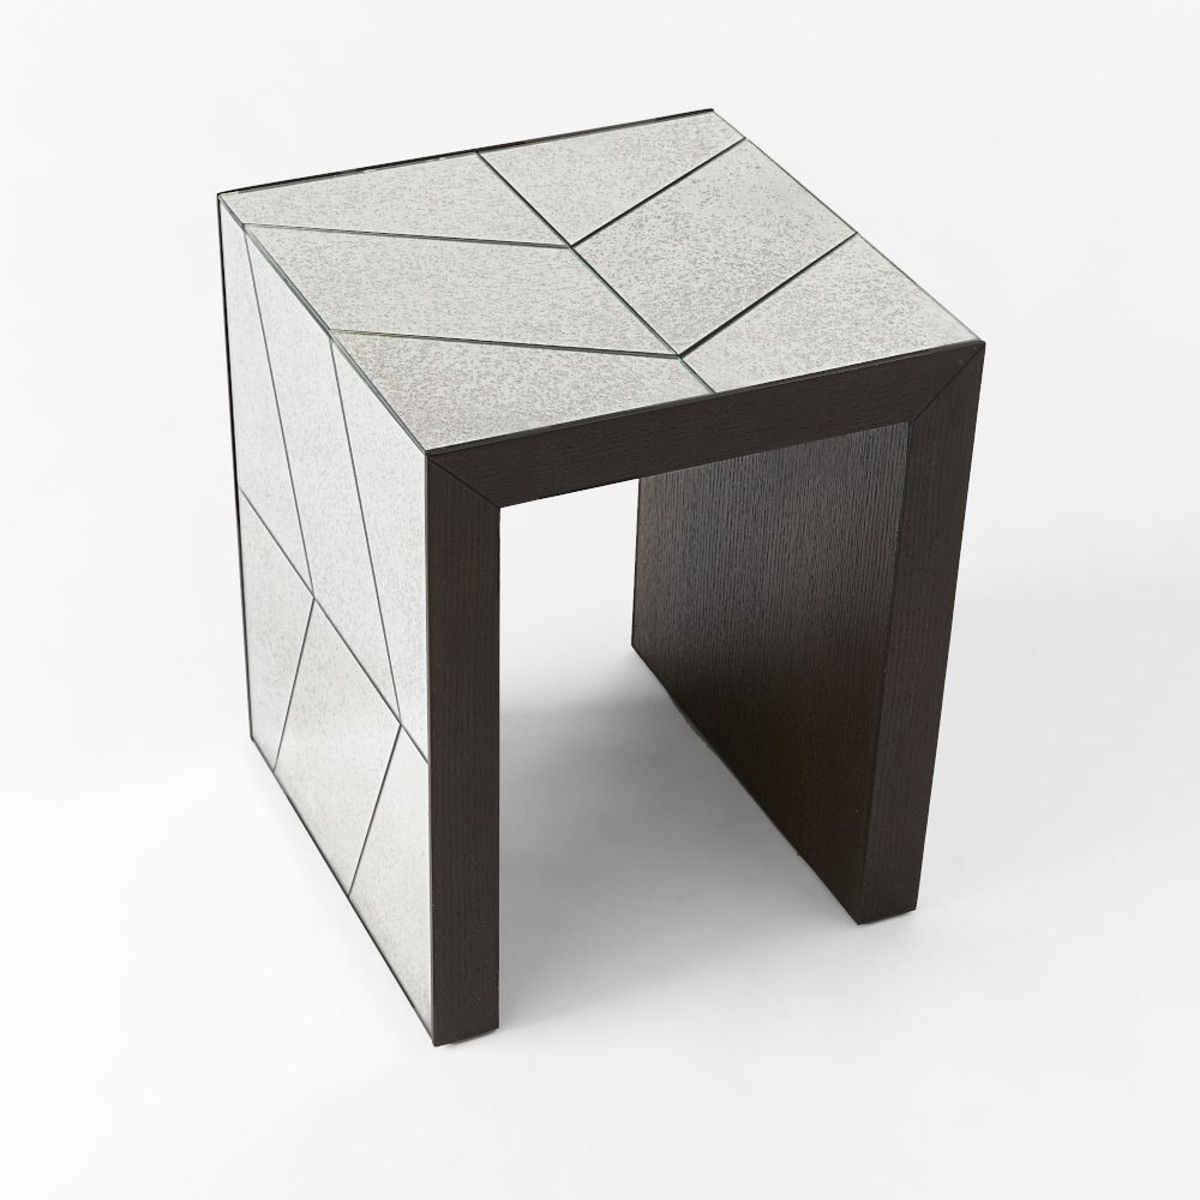 West Elm Mirrored Side Table Credainatconcom - West elm mirrored side table